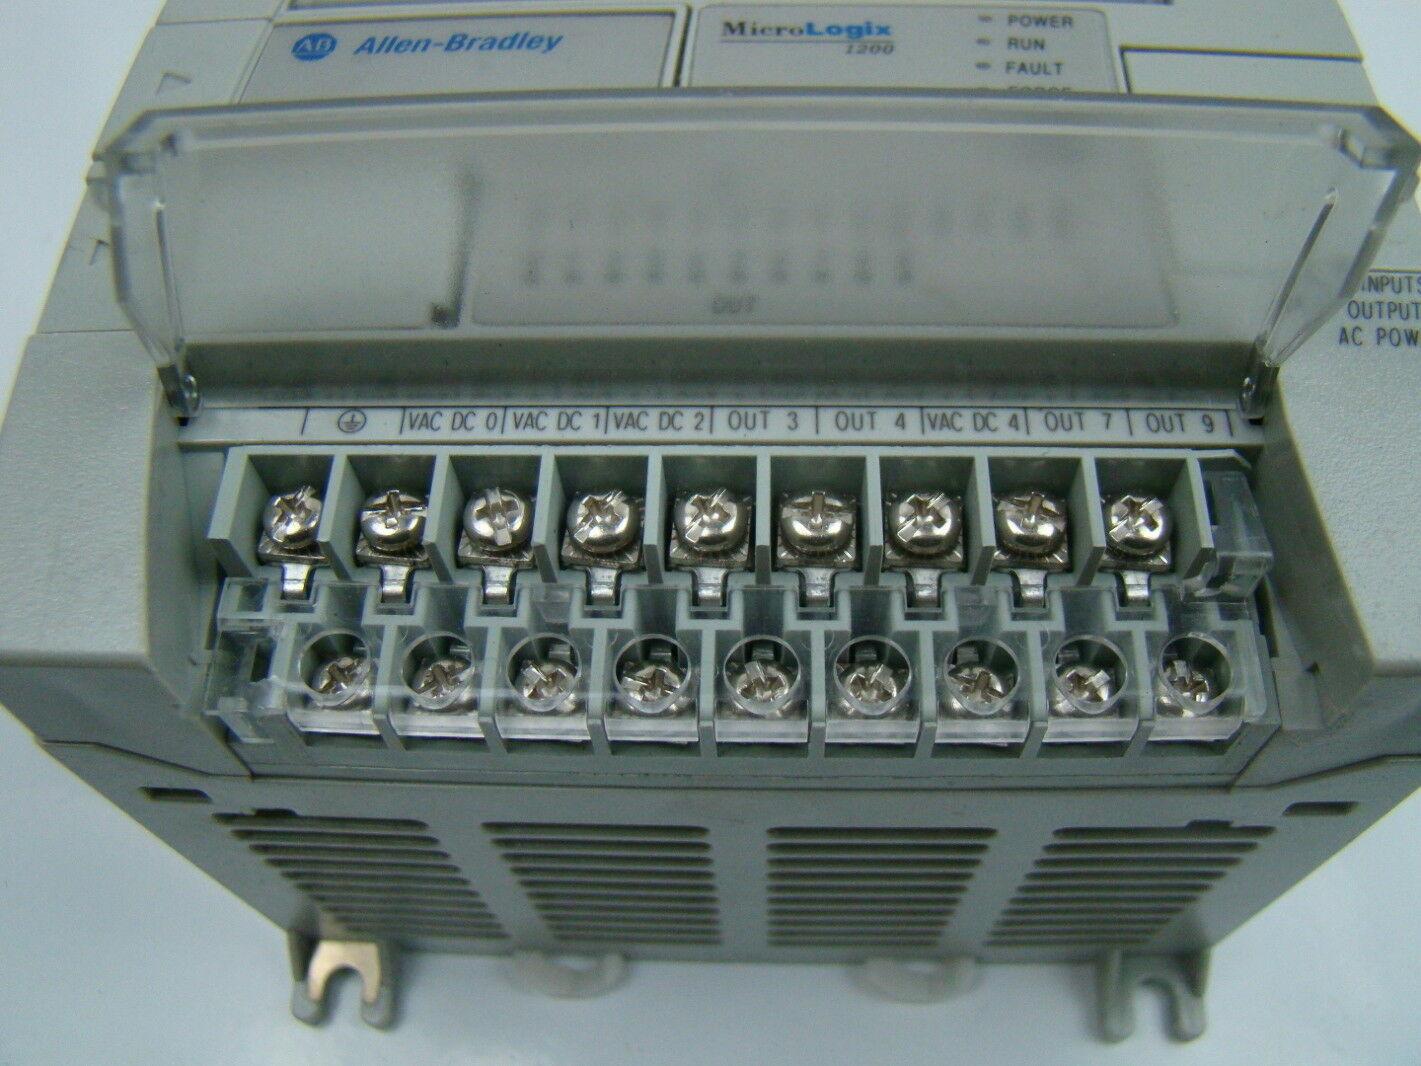 jf04712 allen bradley 24 volt micrologix controller 1200 1762 l24bwa 3 micrologix controller dolgular com 1762-l24bwa wiring diagram at edmiracle.co